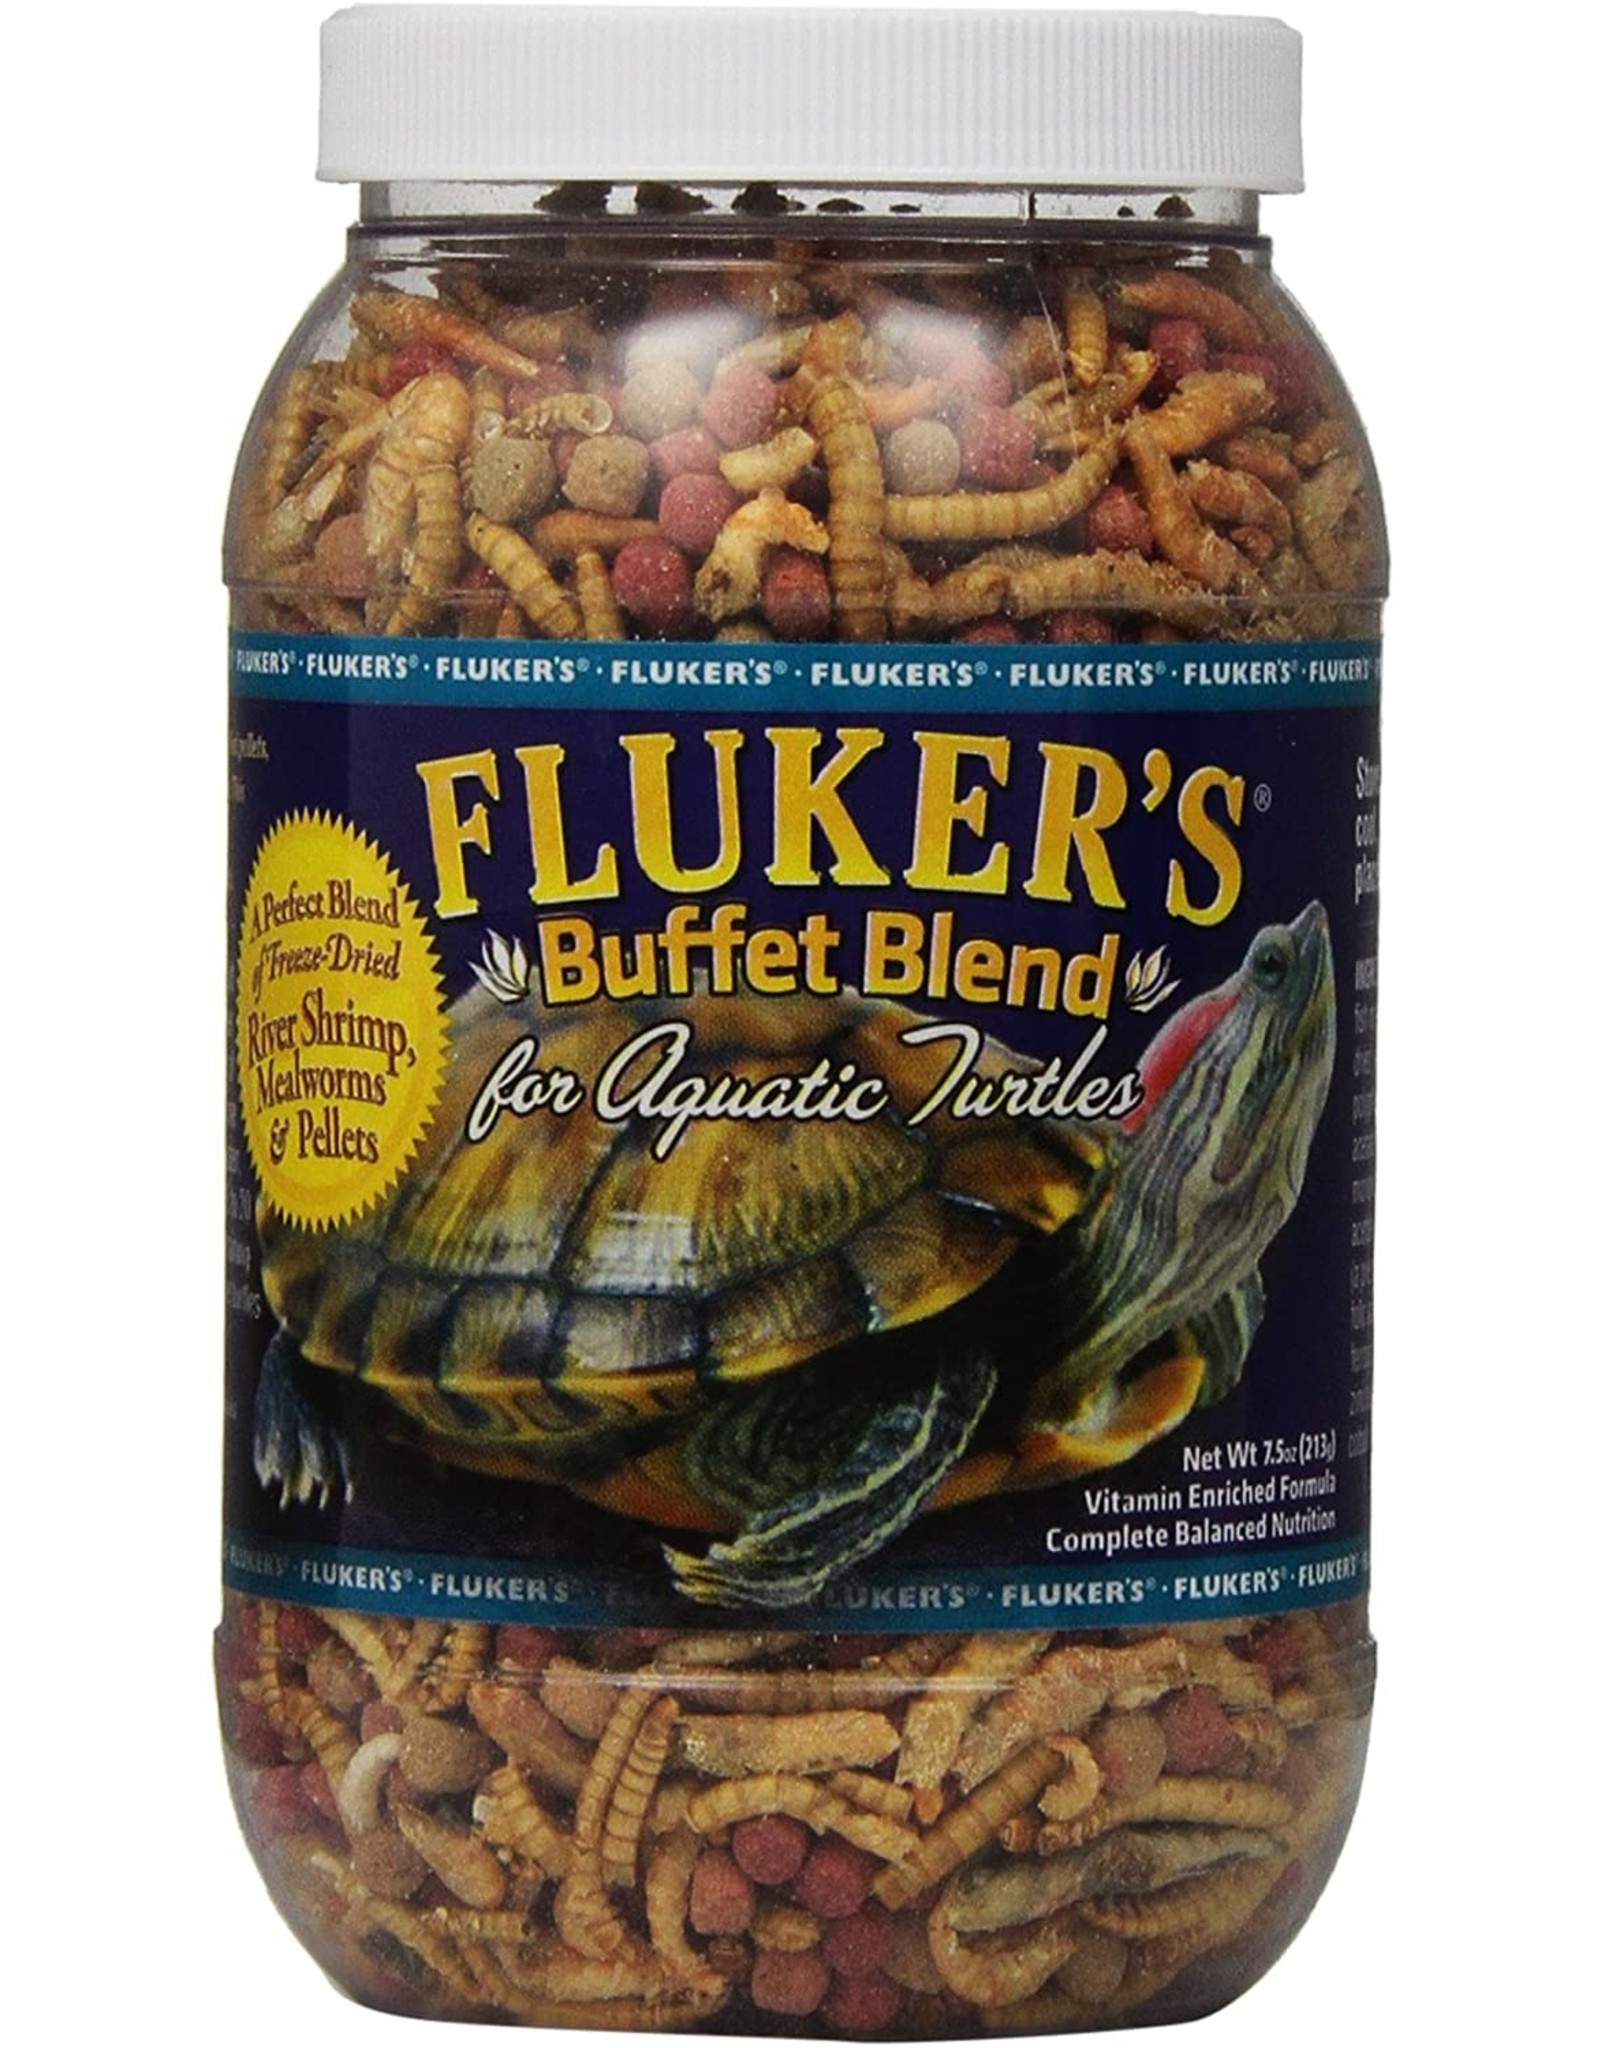 Fluker's Fluker's Buffet Blend Aquatic Turtle Formula 7.5 ounce